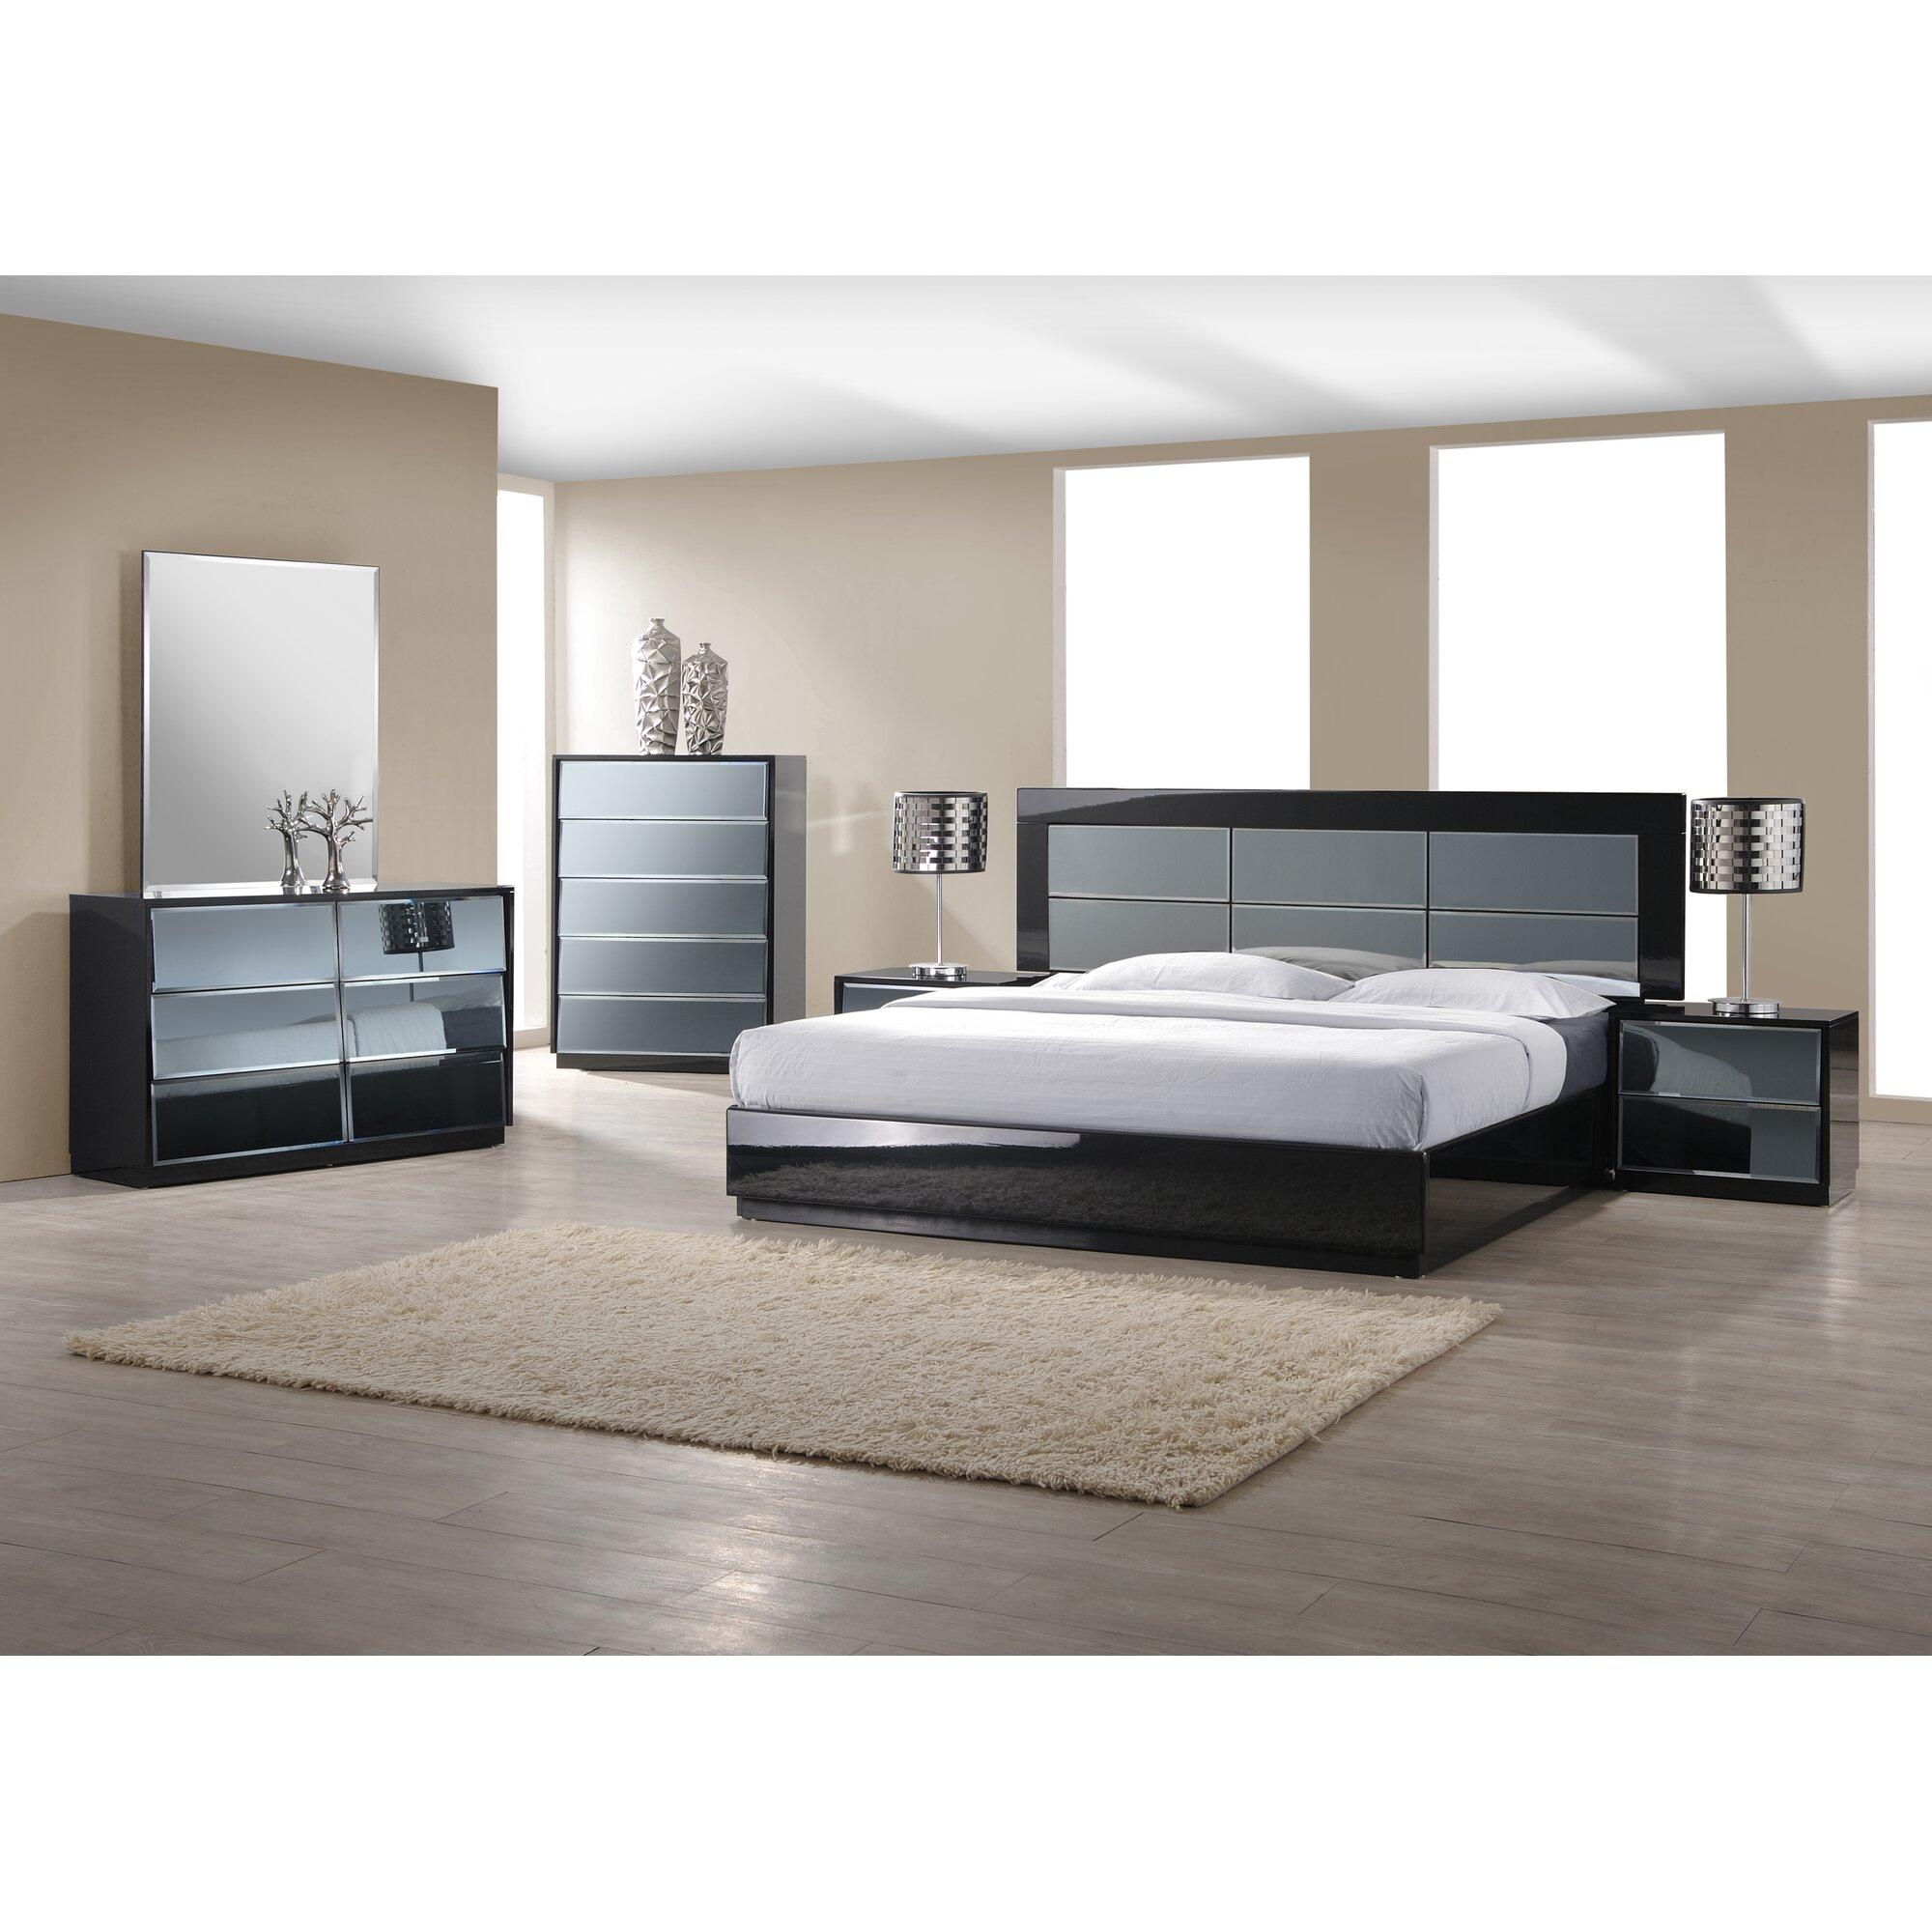 bedroom sets contemporary preparing decorate contemporary bed  - modern contemporary bedroom sets allmodern  contemporary bedrooms sets